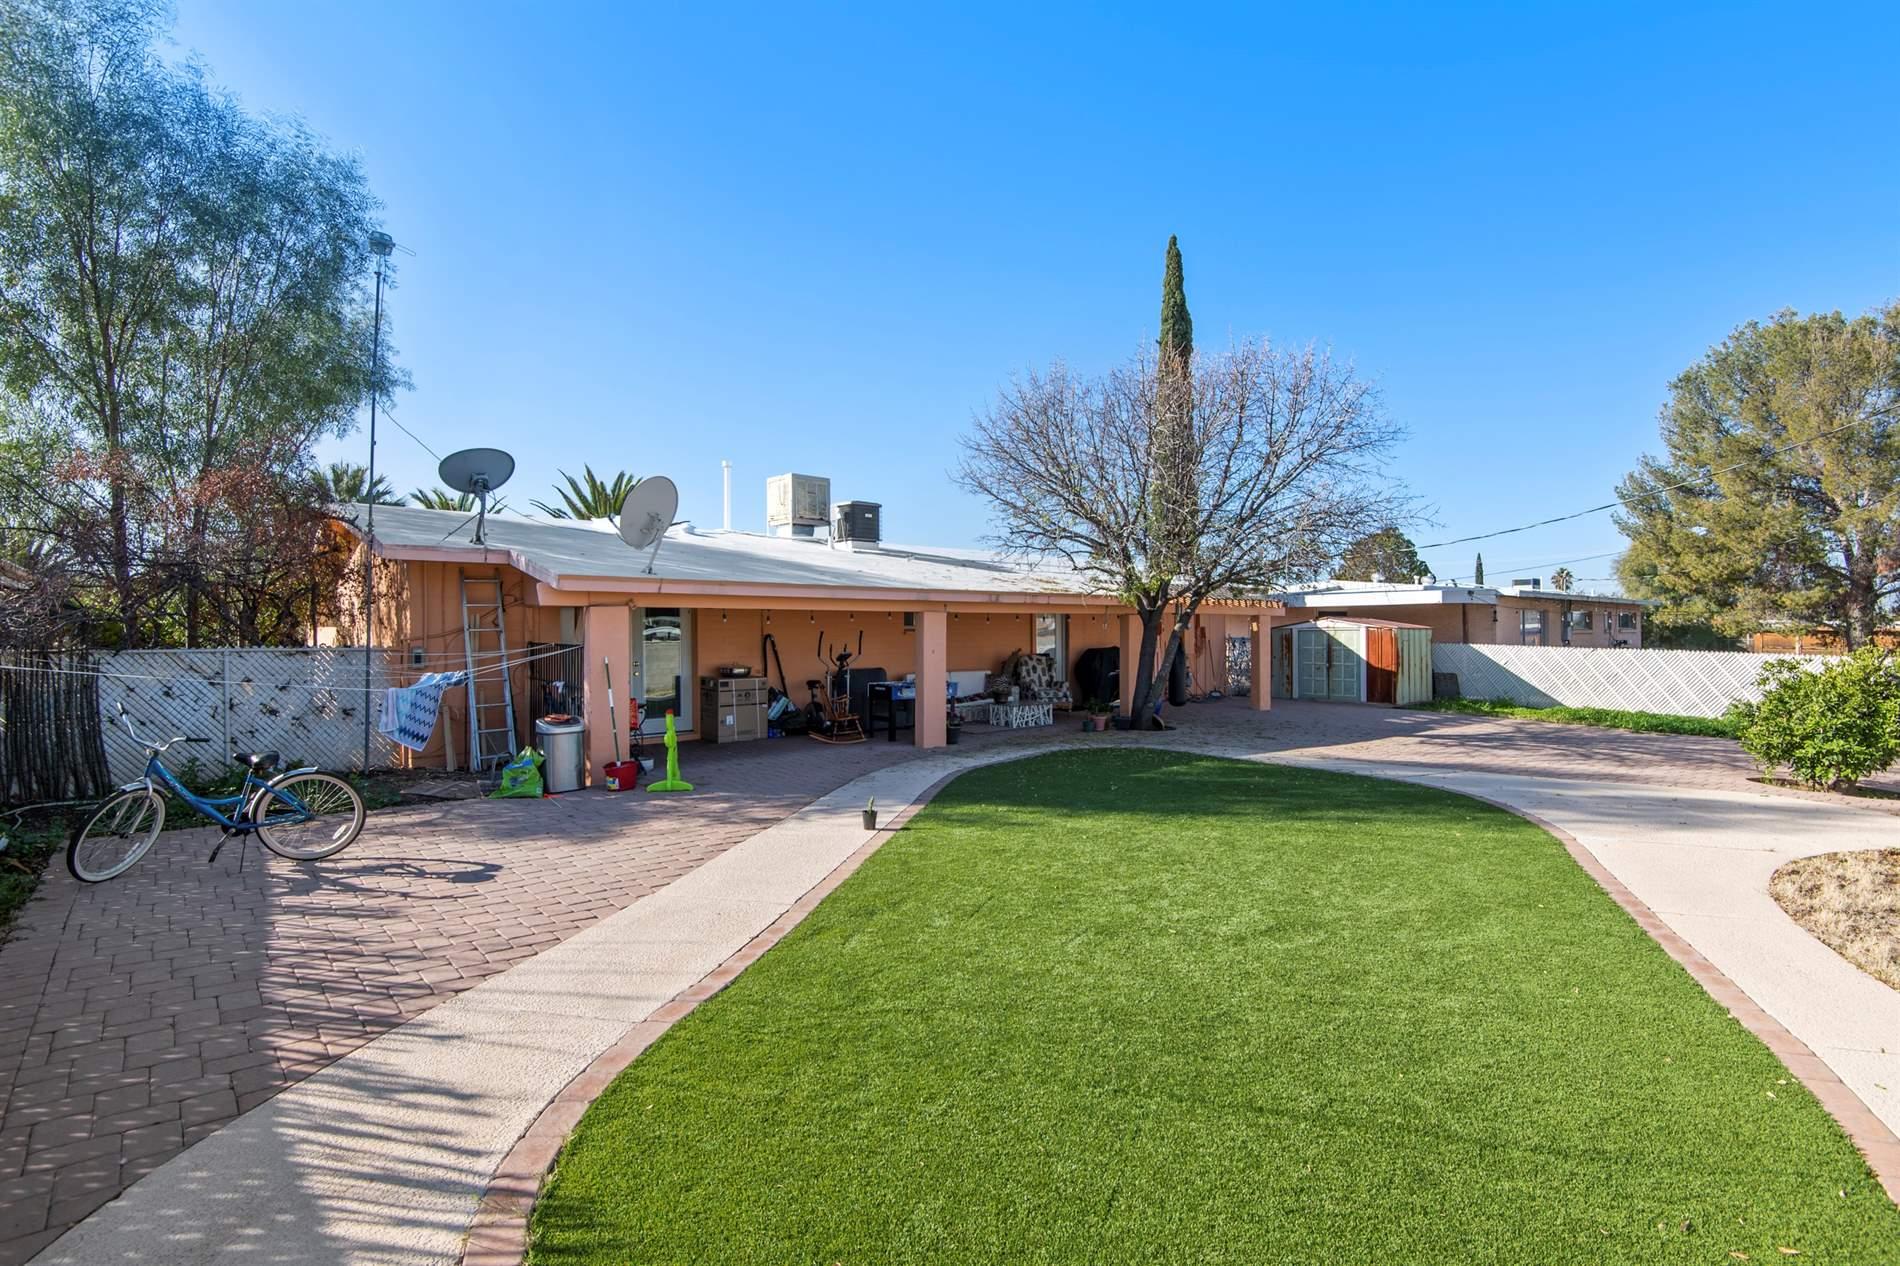 6731 E Nelson Dr, Tucson, AZ 85730